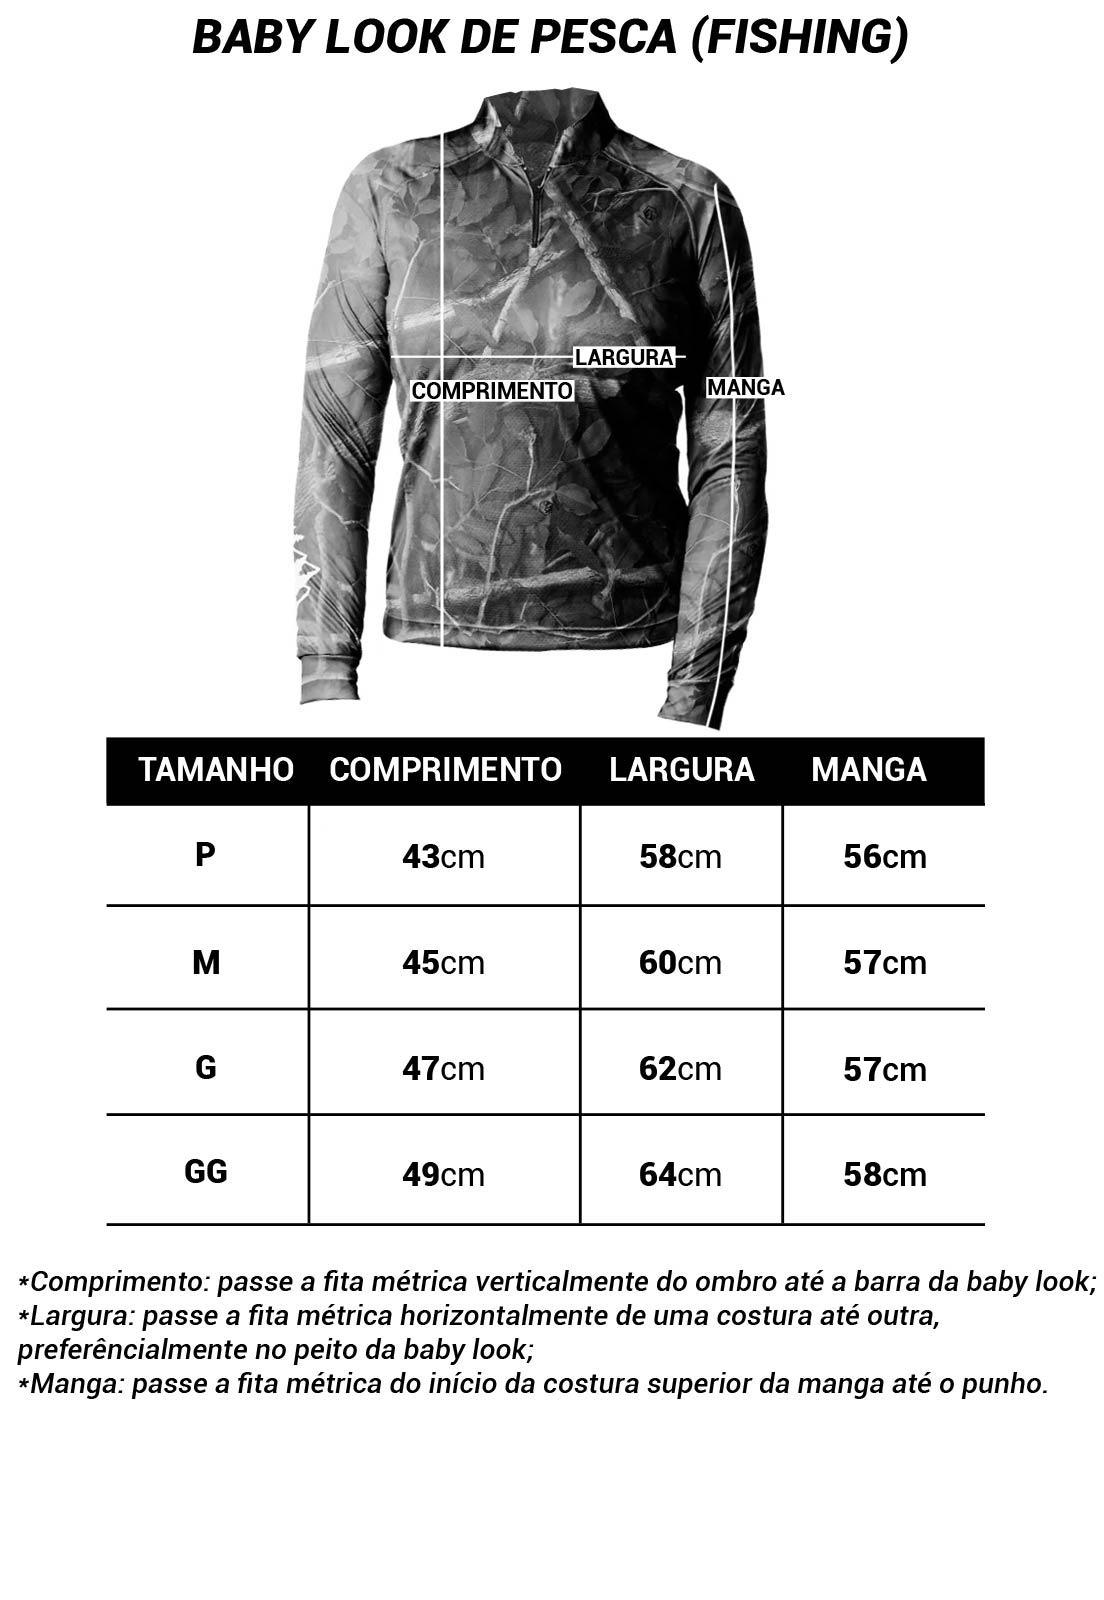 CAMISA DE PESCA FISH PINTADO 01 FEMININA + BANDANA GRÁTIS  - REAL HUNTER OUTDOORS